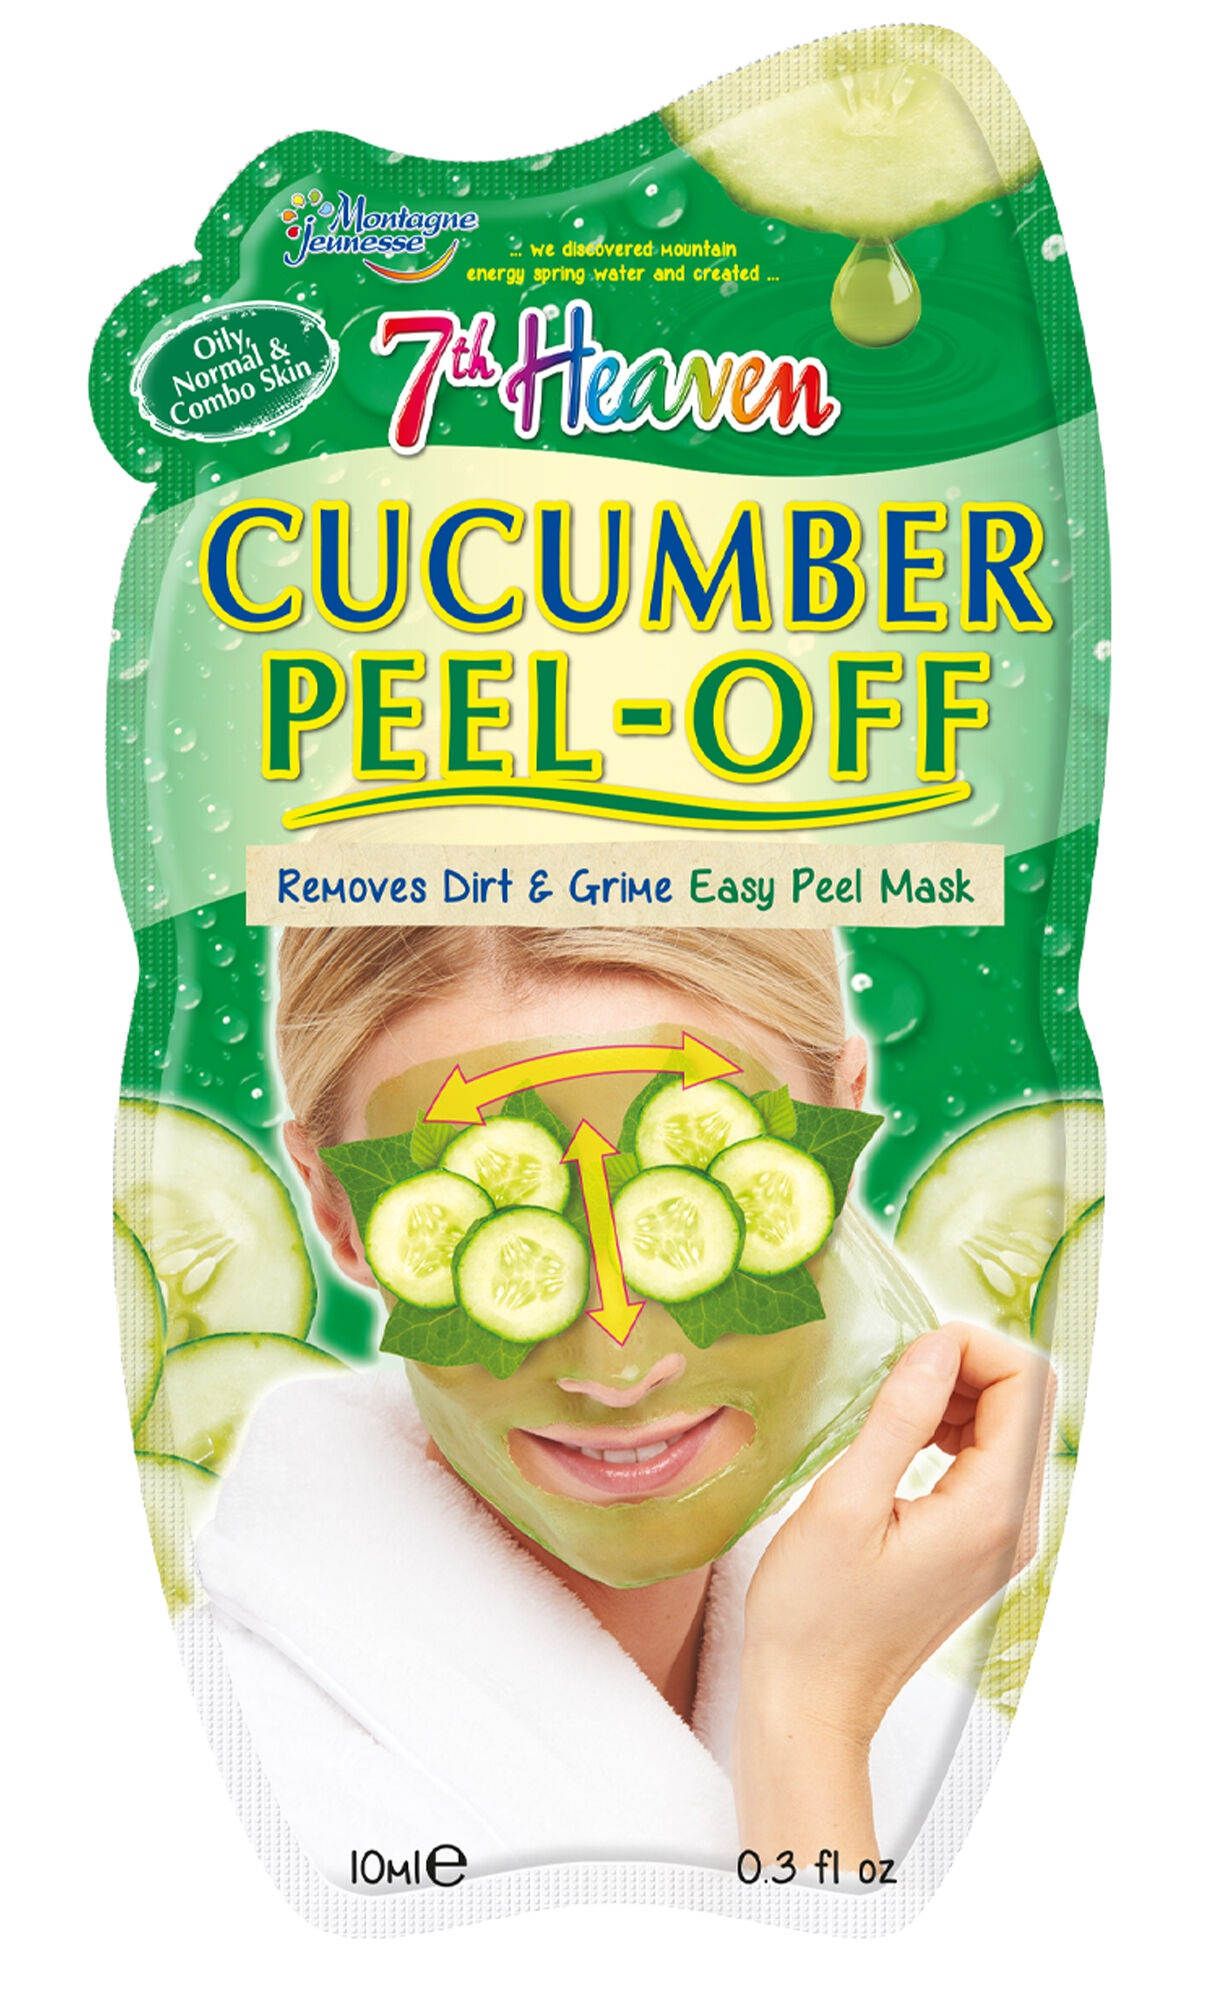 7th Heaven Cucumber Peel-off